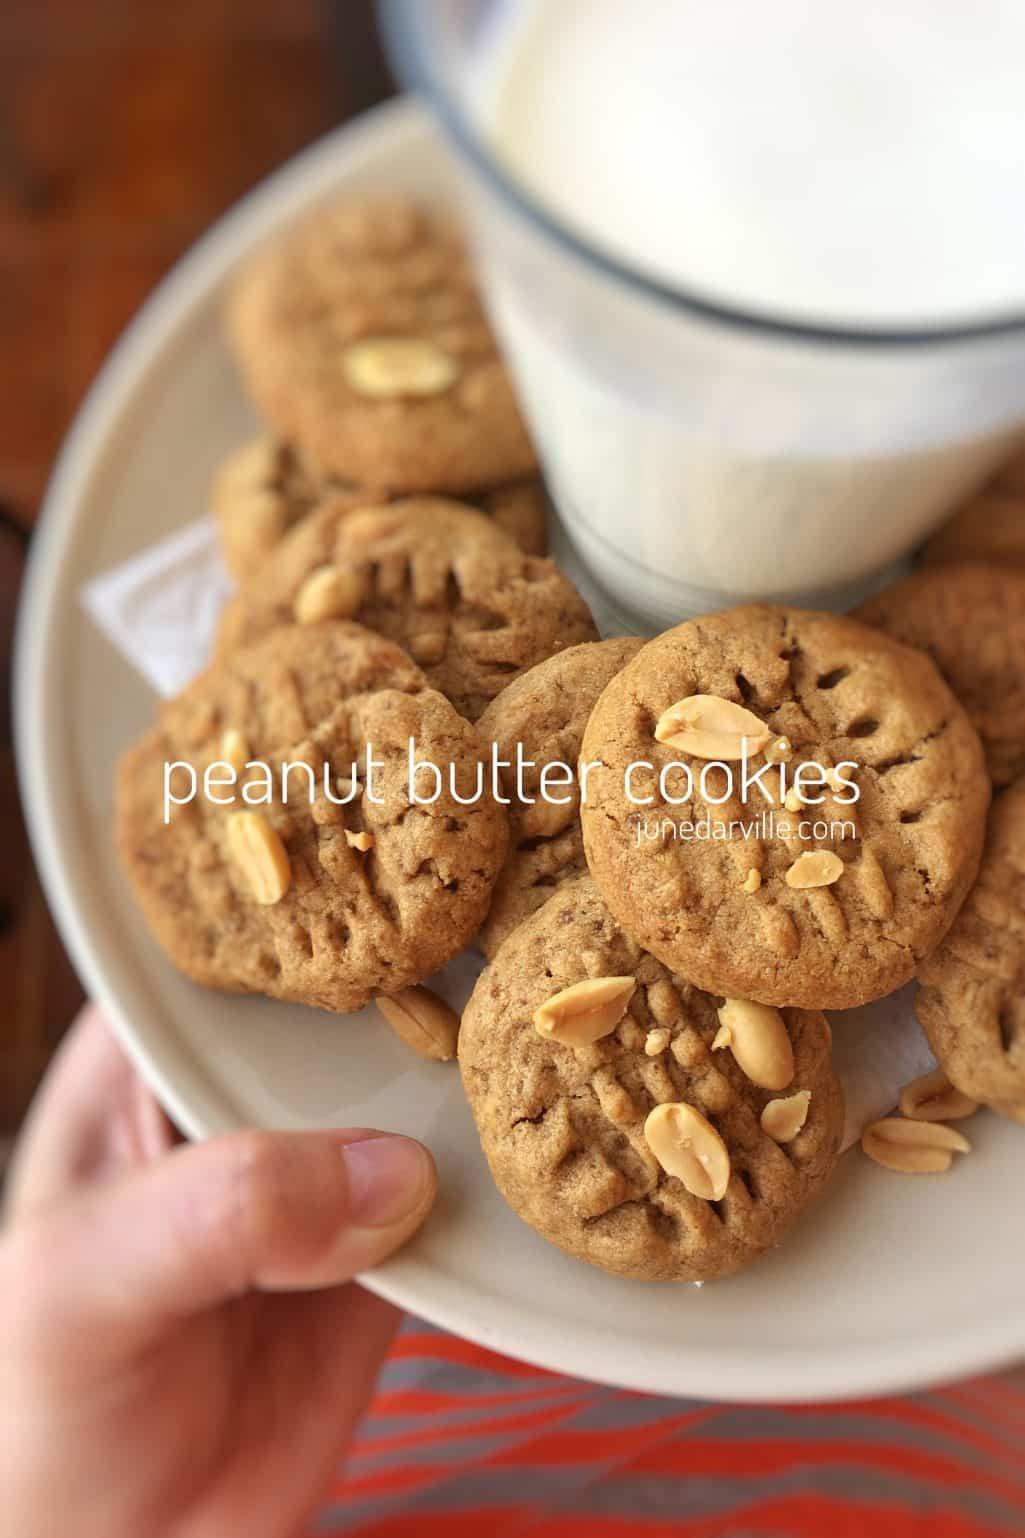 Easy Peanut Butter Cookies  Easy Peanut Butter Cookies Recipe